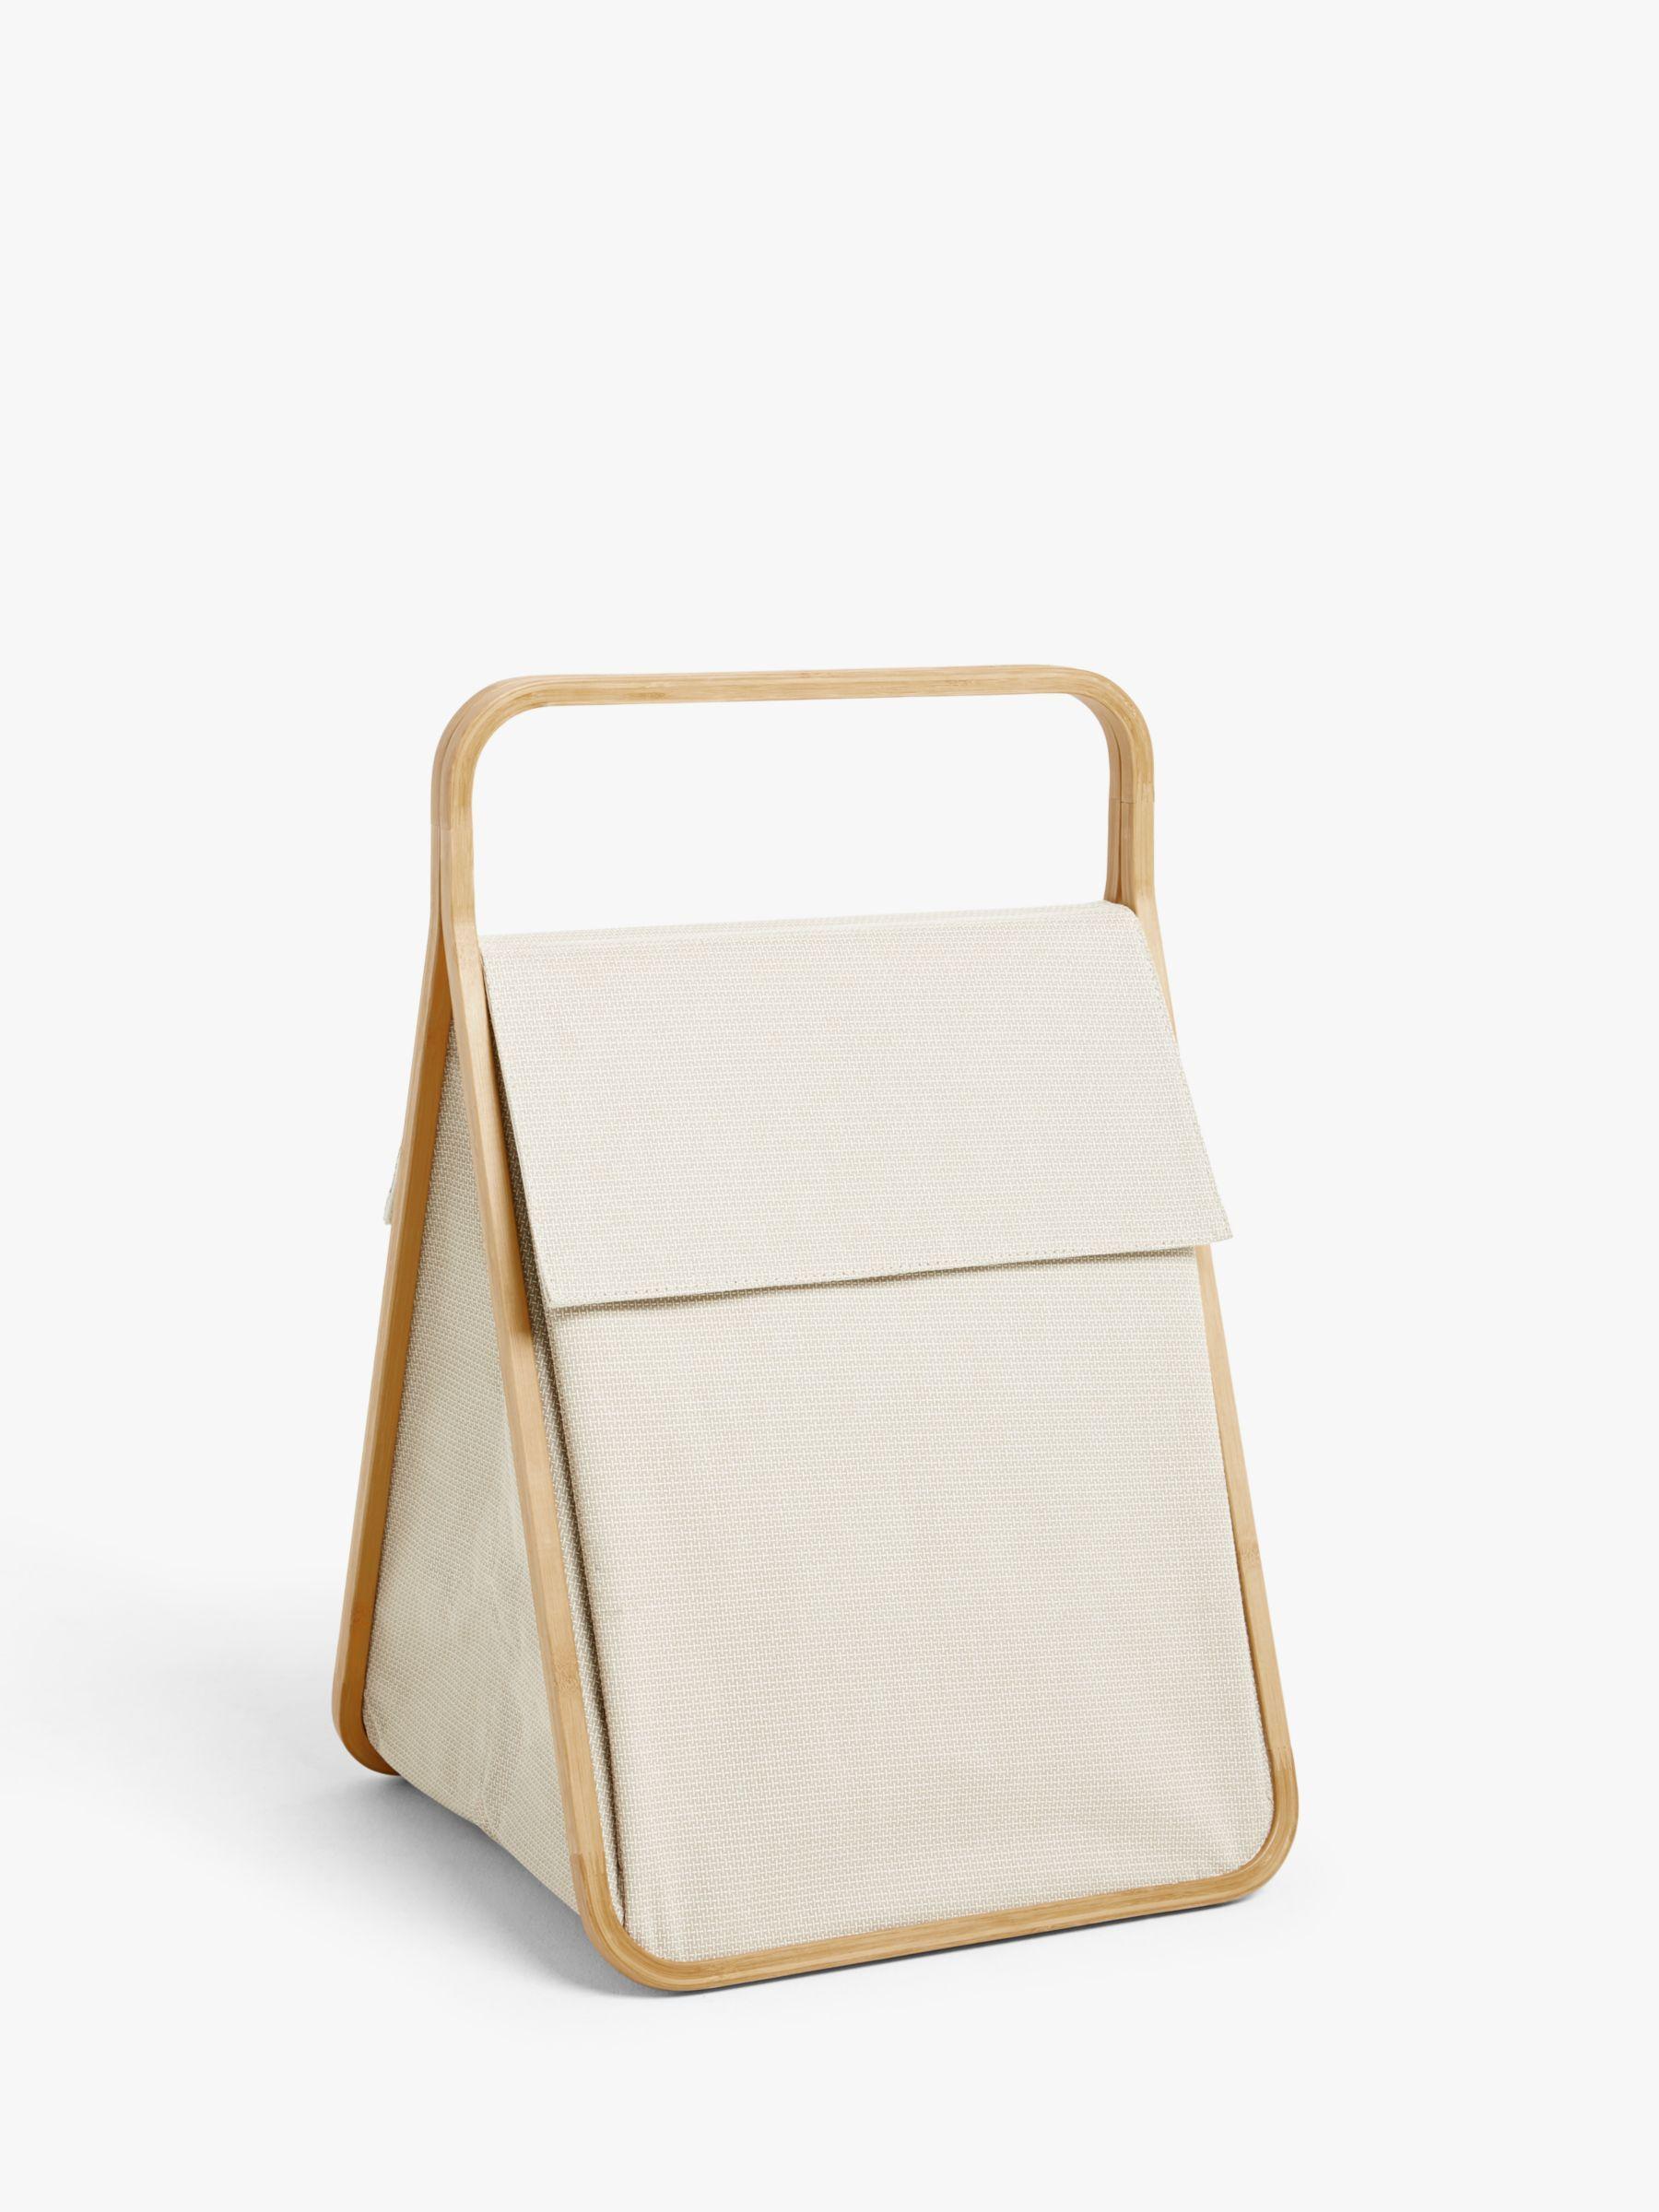 John Lewis & Partners 2 Section Folding Laundry Hamper